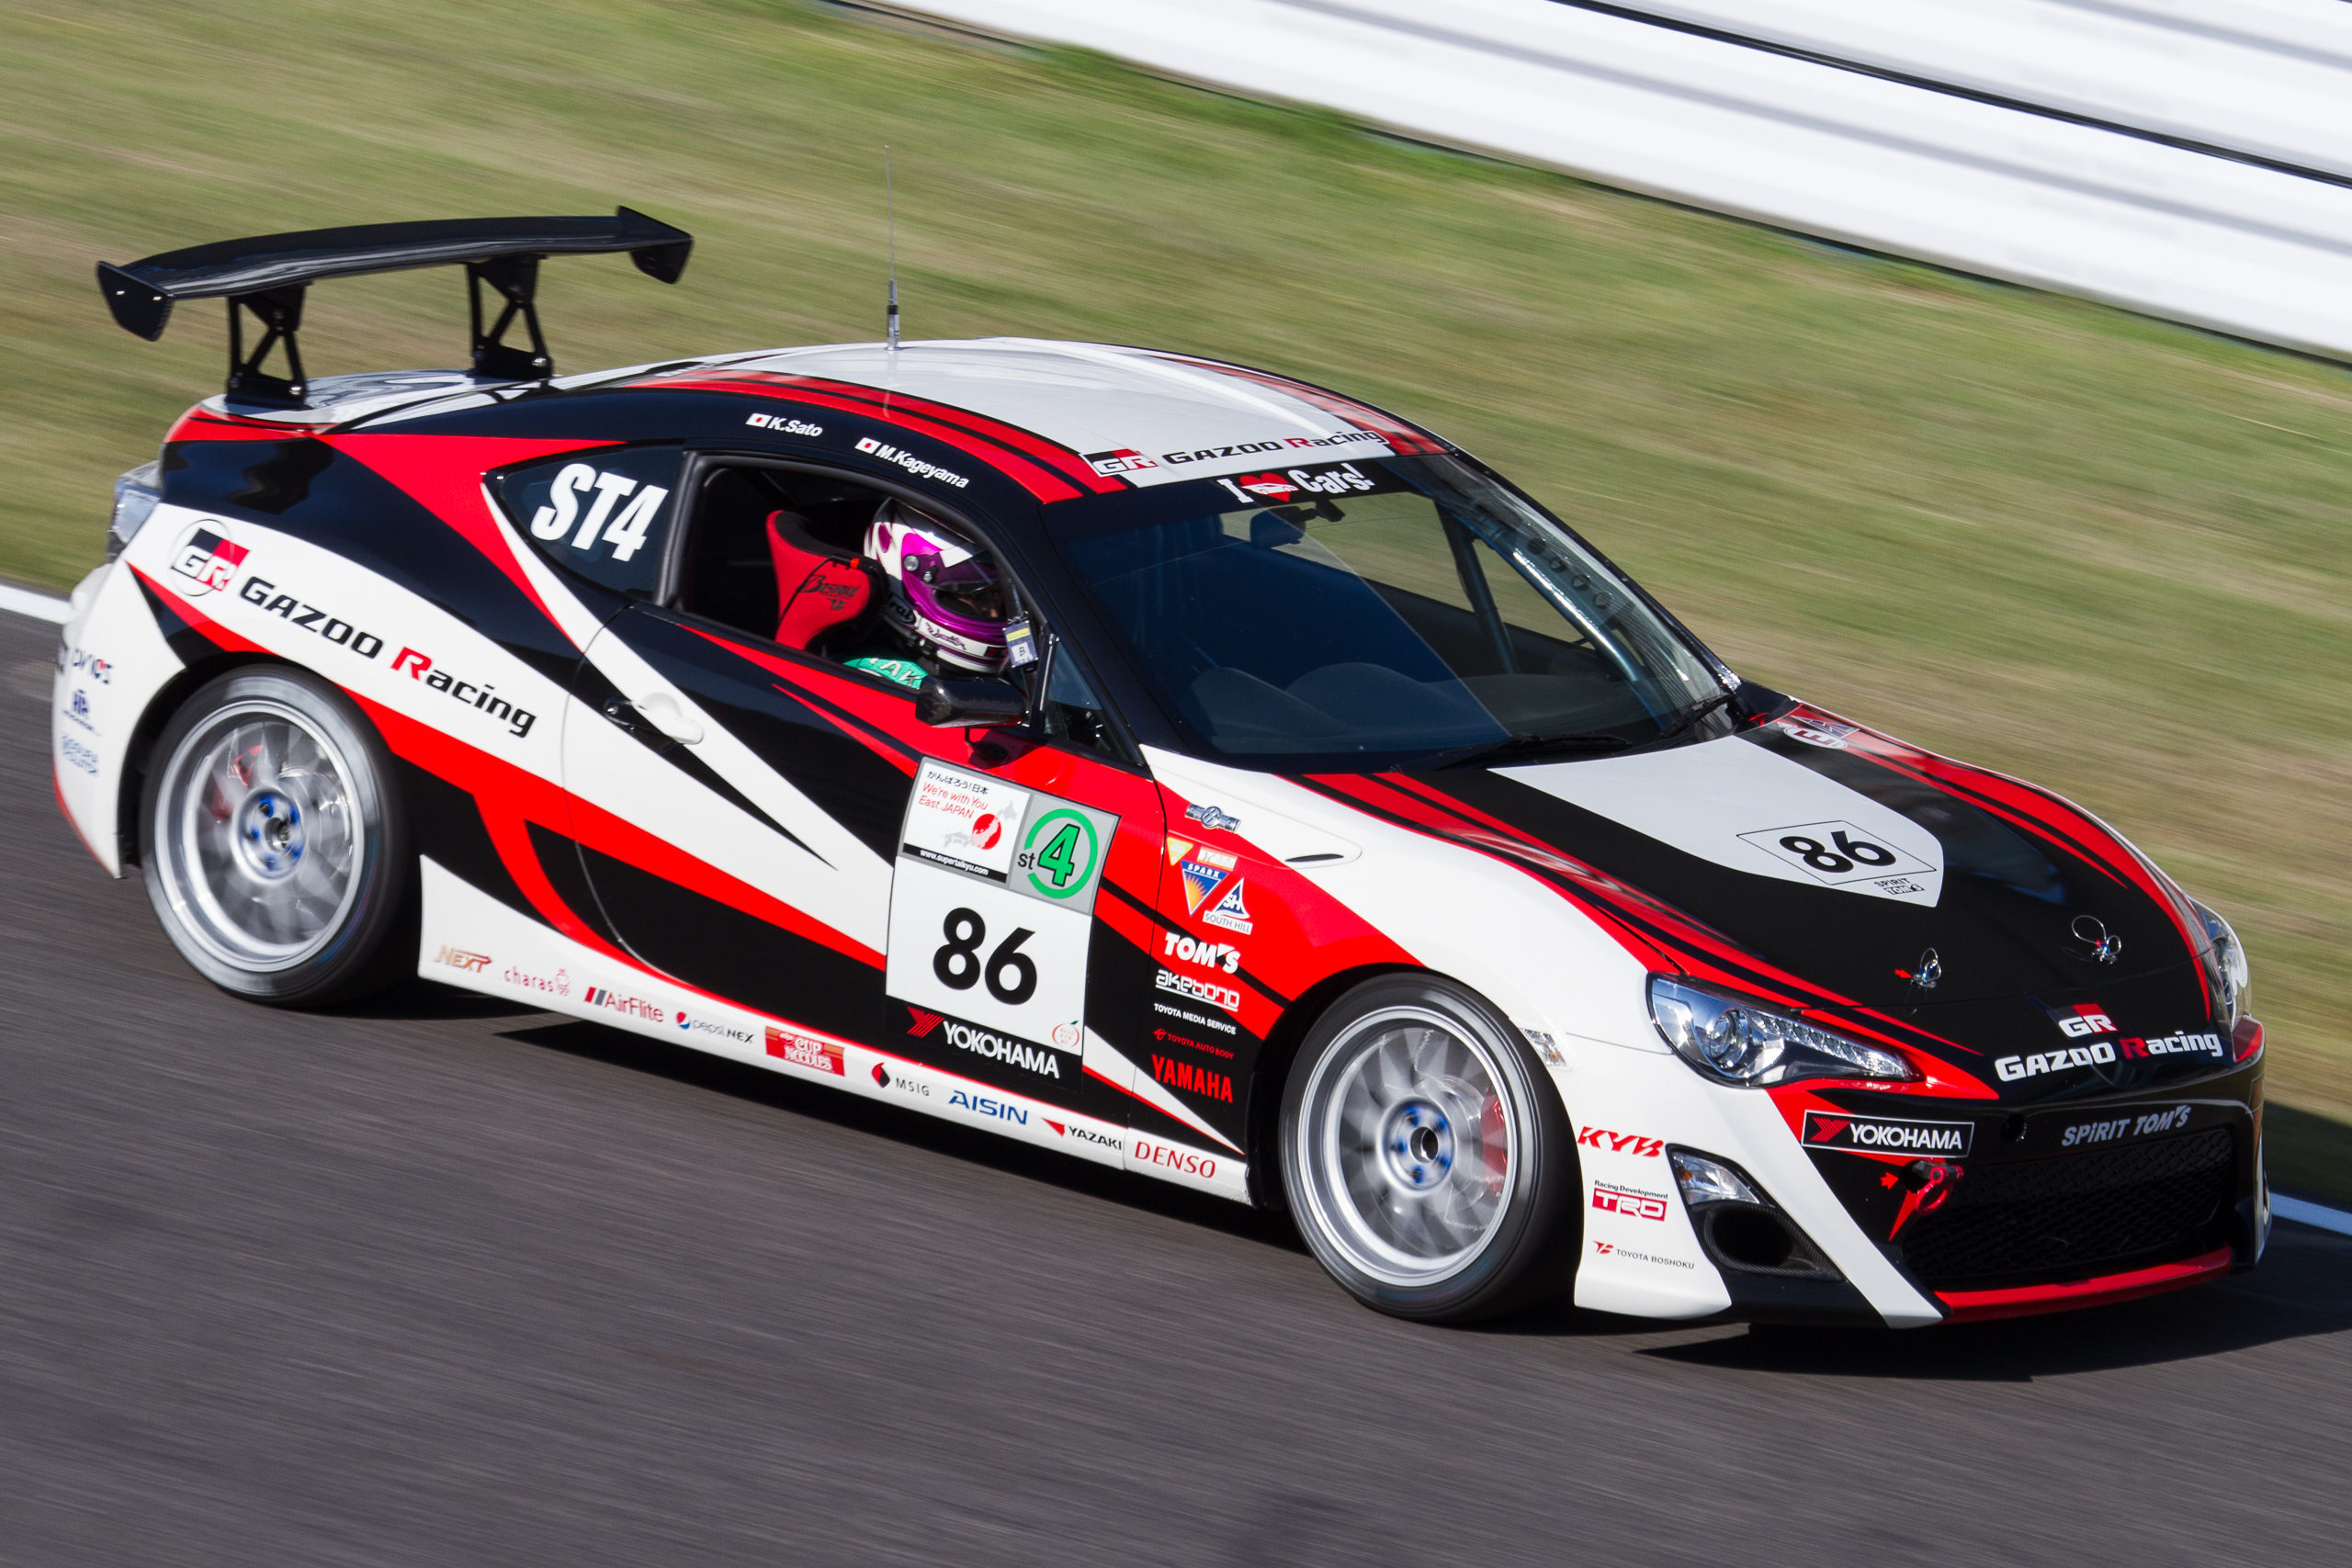 Gazoo_Racing_Toyota_86_2012_Super_Taikyu